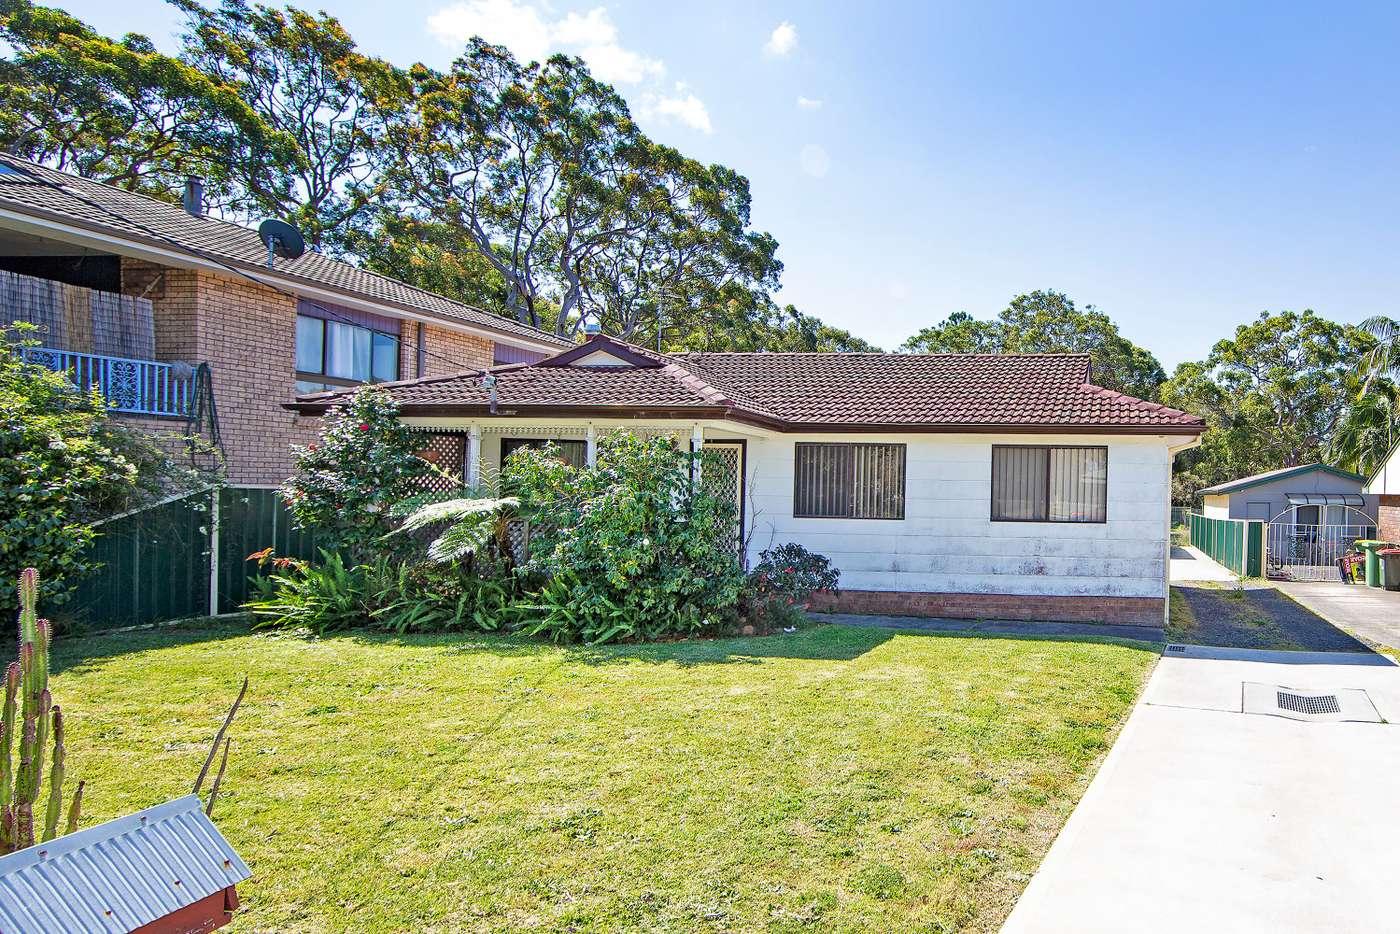 Main view of Homely house listing, 21 Lilo Avenue, Halekulani NSW 2262